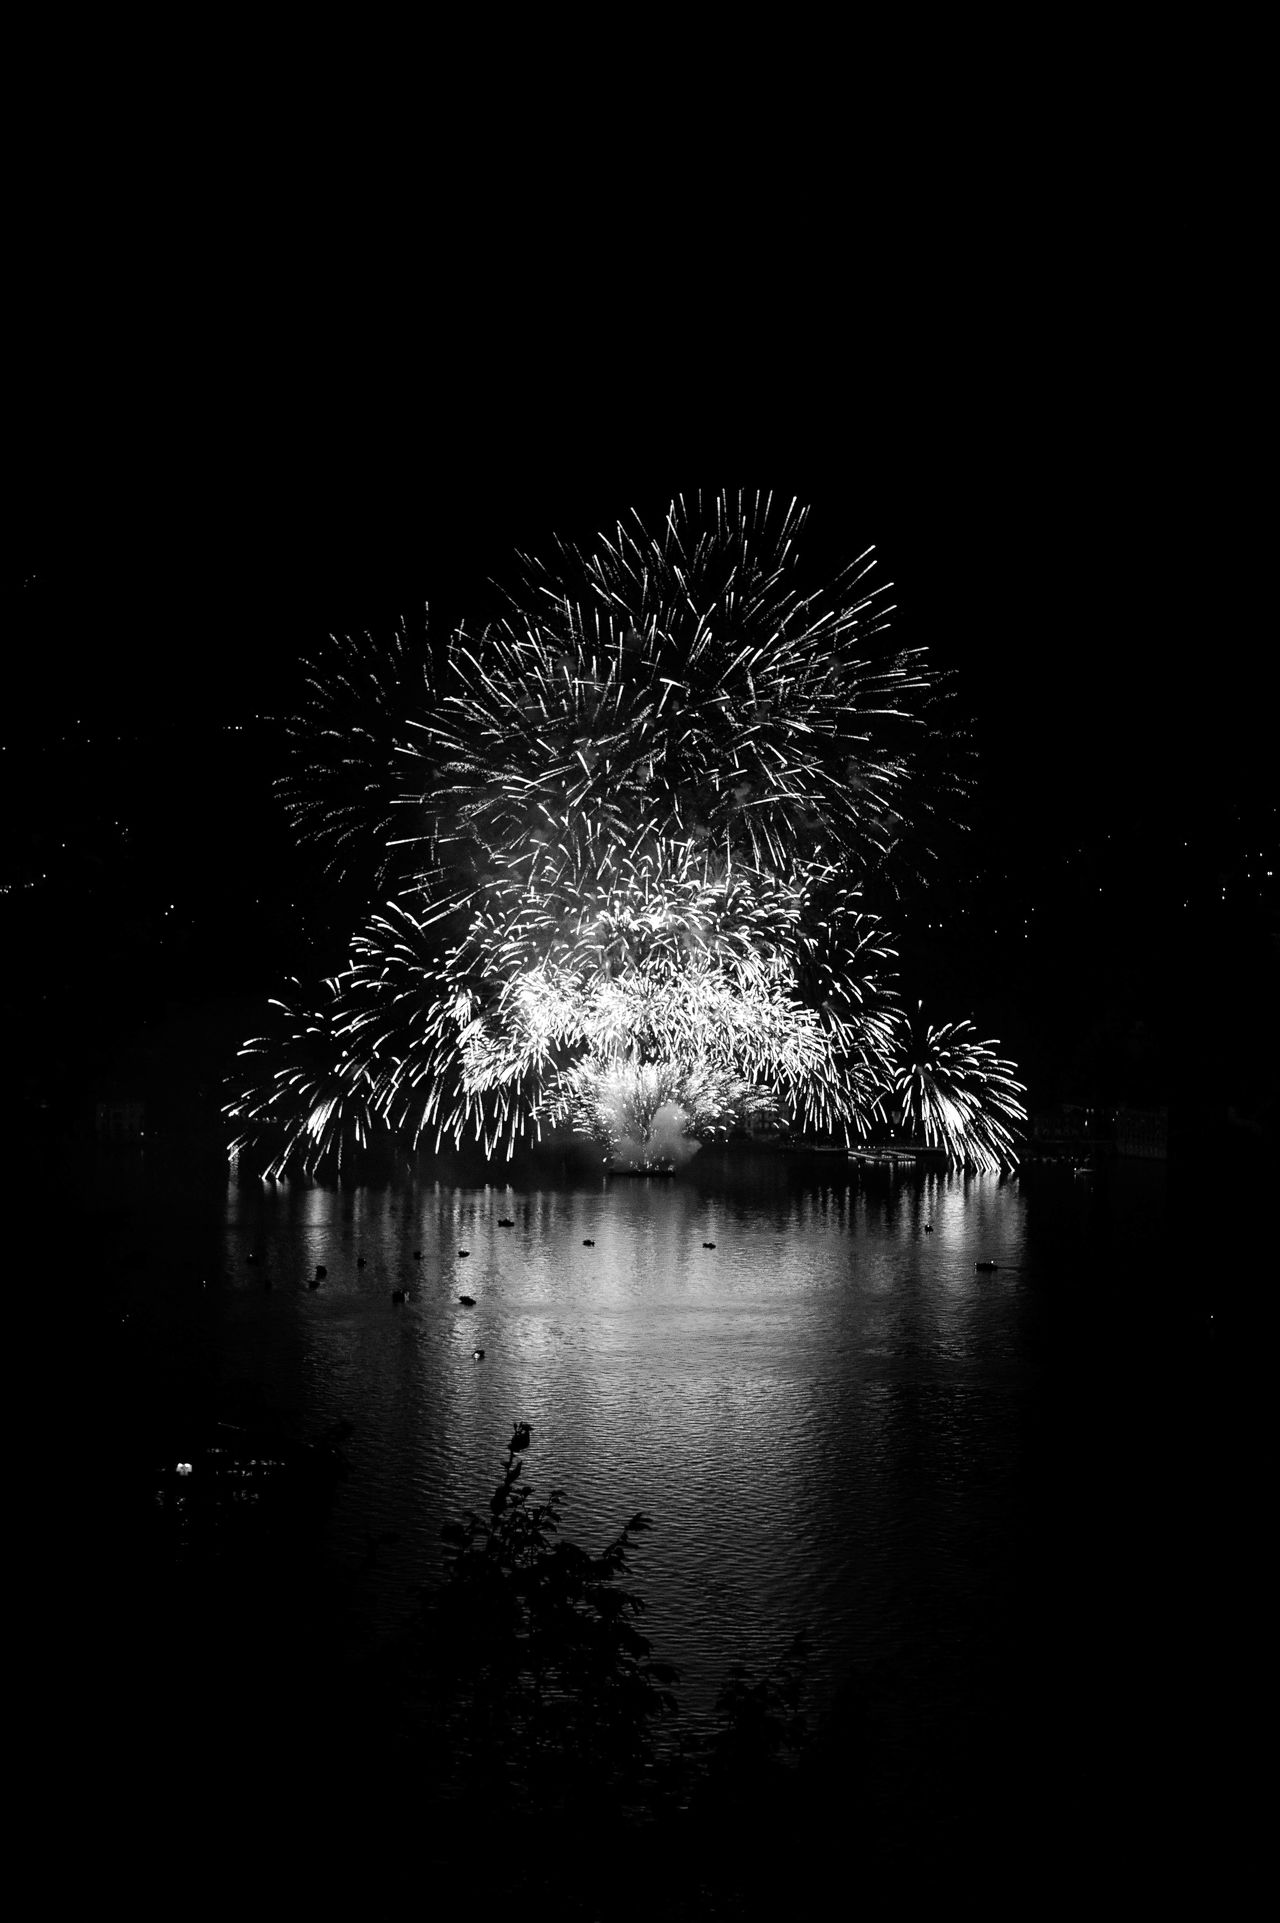 14 Juillet Celebration Firework Display Fireworks Illuminated Italy Nature Night No People Outdoors Reflection Villa D'Este Water Waterfront